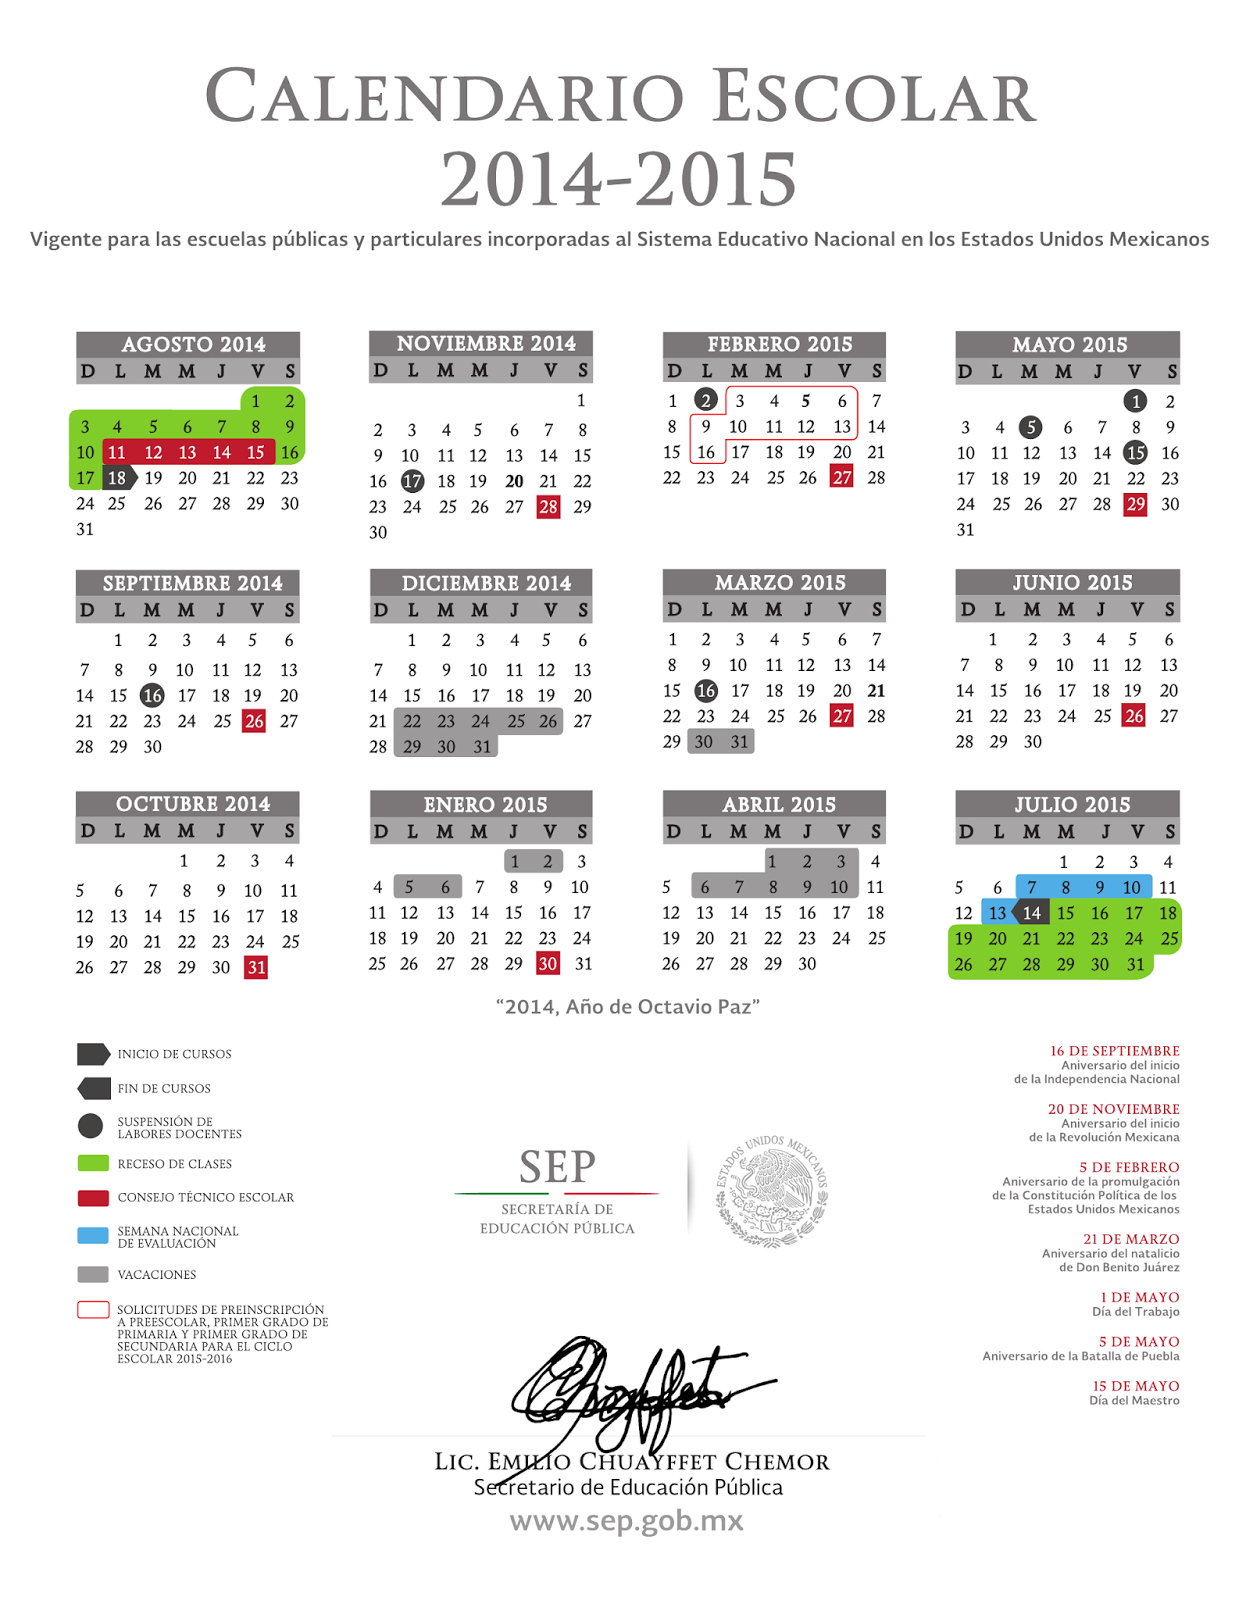 SEP: http://www.sep.gob.mx/es/sep1/Calendario_2014_2015 y http://goo ...